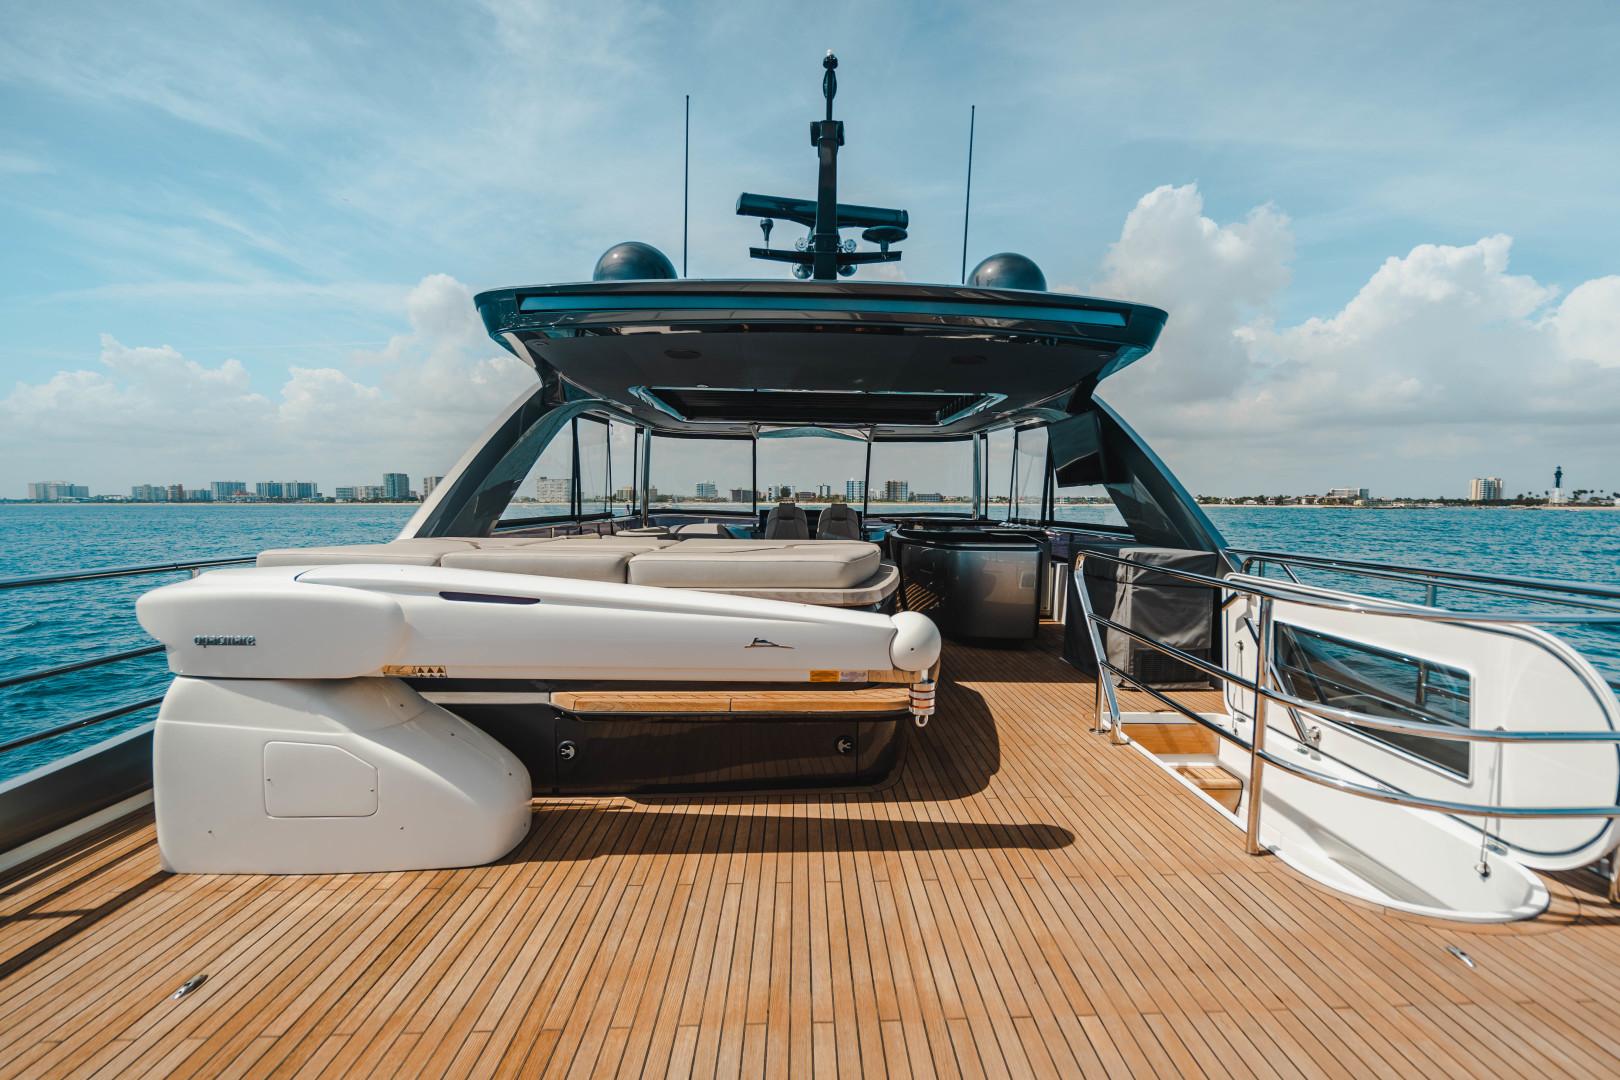 Princess-Y85  2019-Splash Delray Beach-Florida-United States-1631628 | Thumbnail